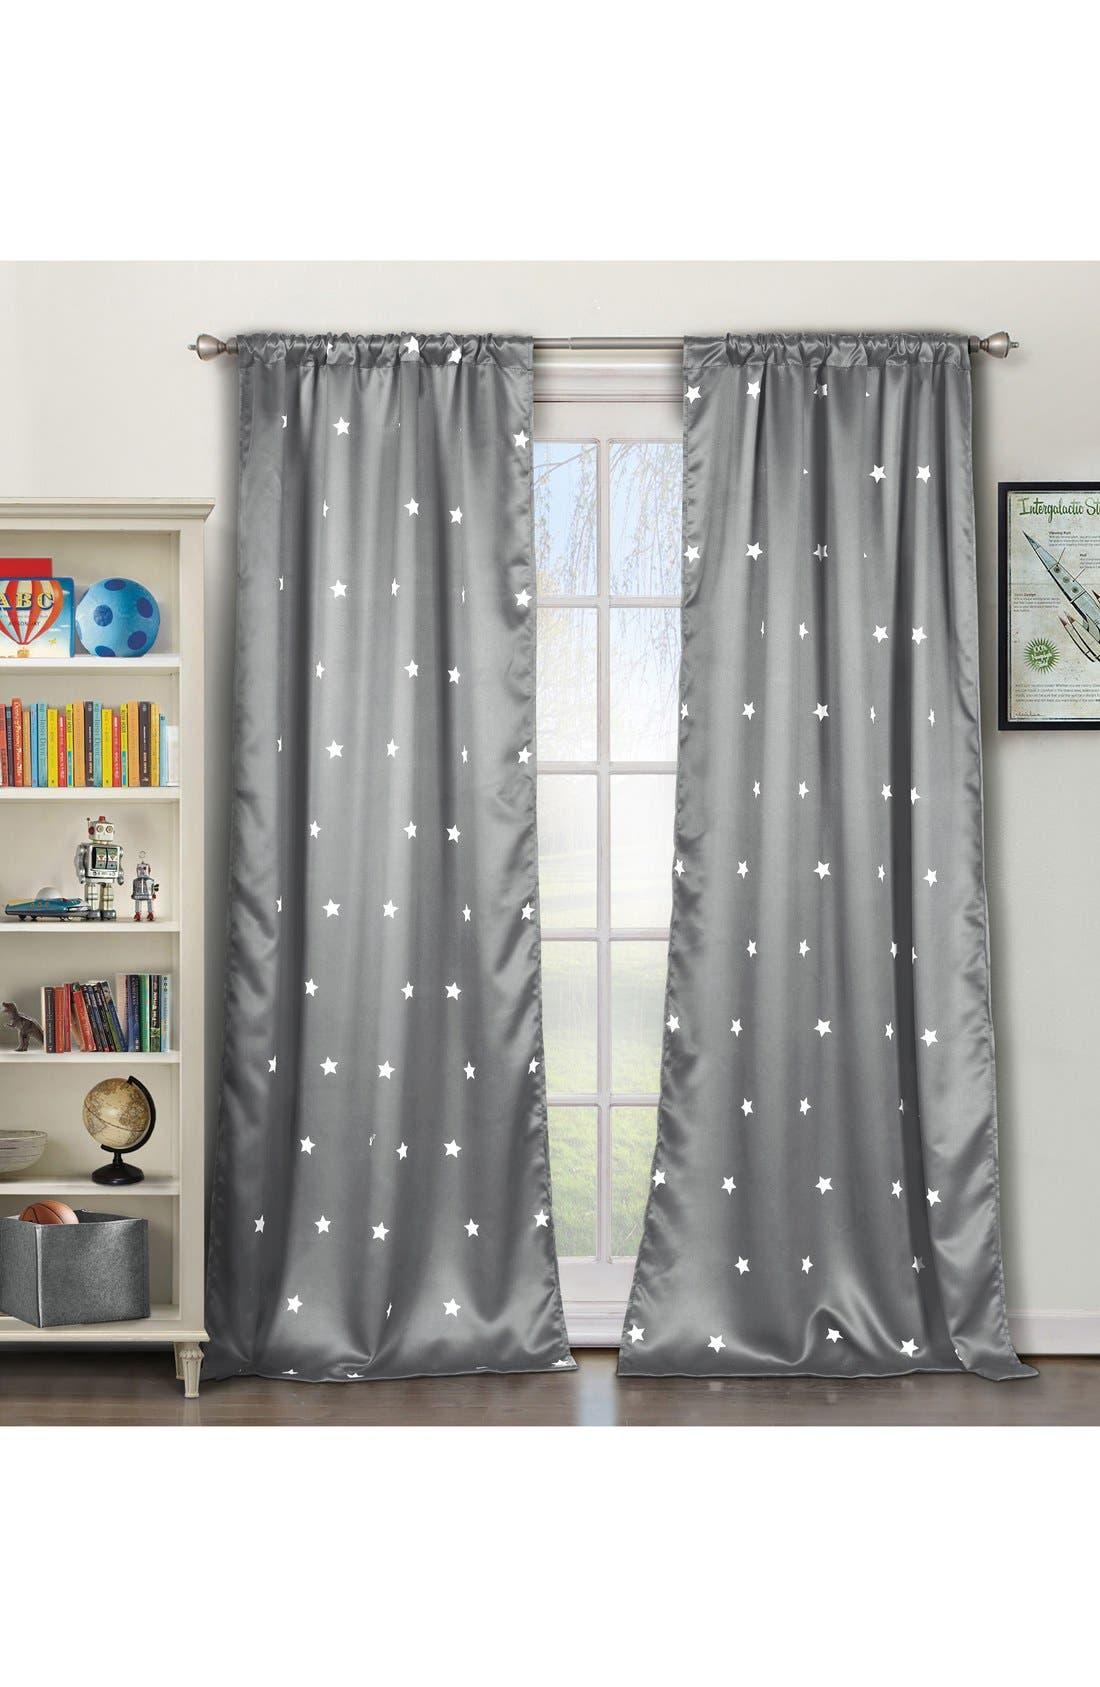 Main Image - LALA + BASH Gruden Window Panels